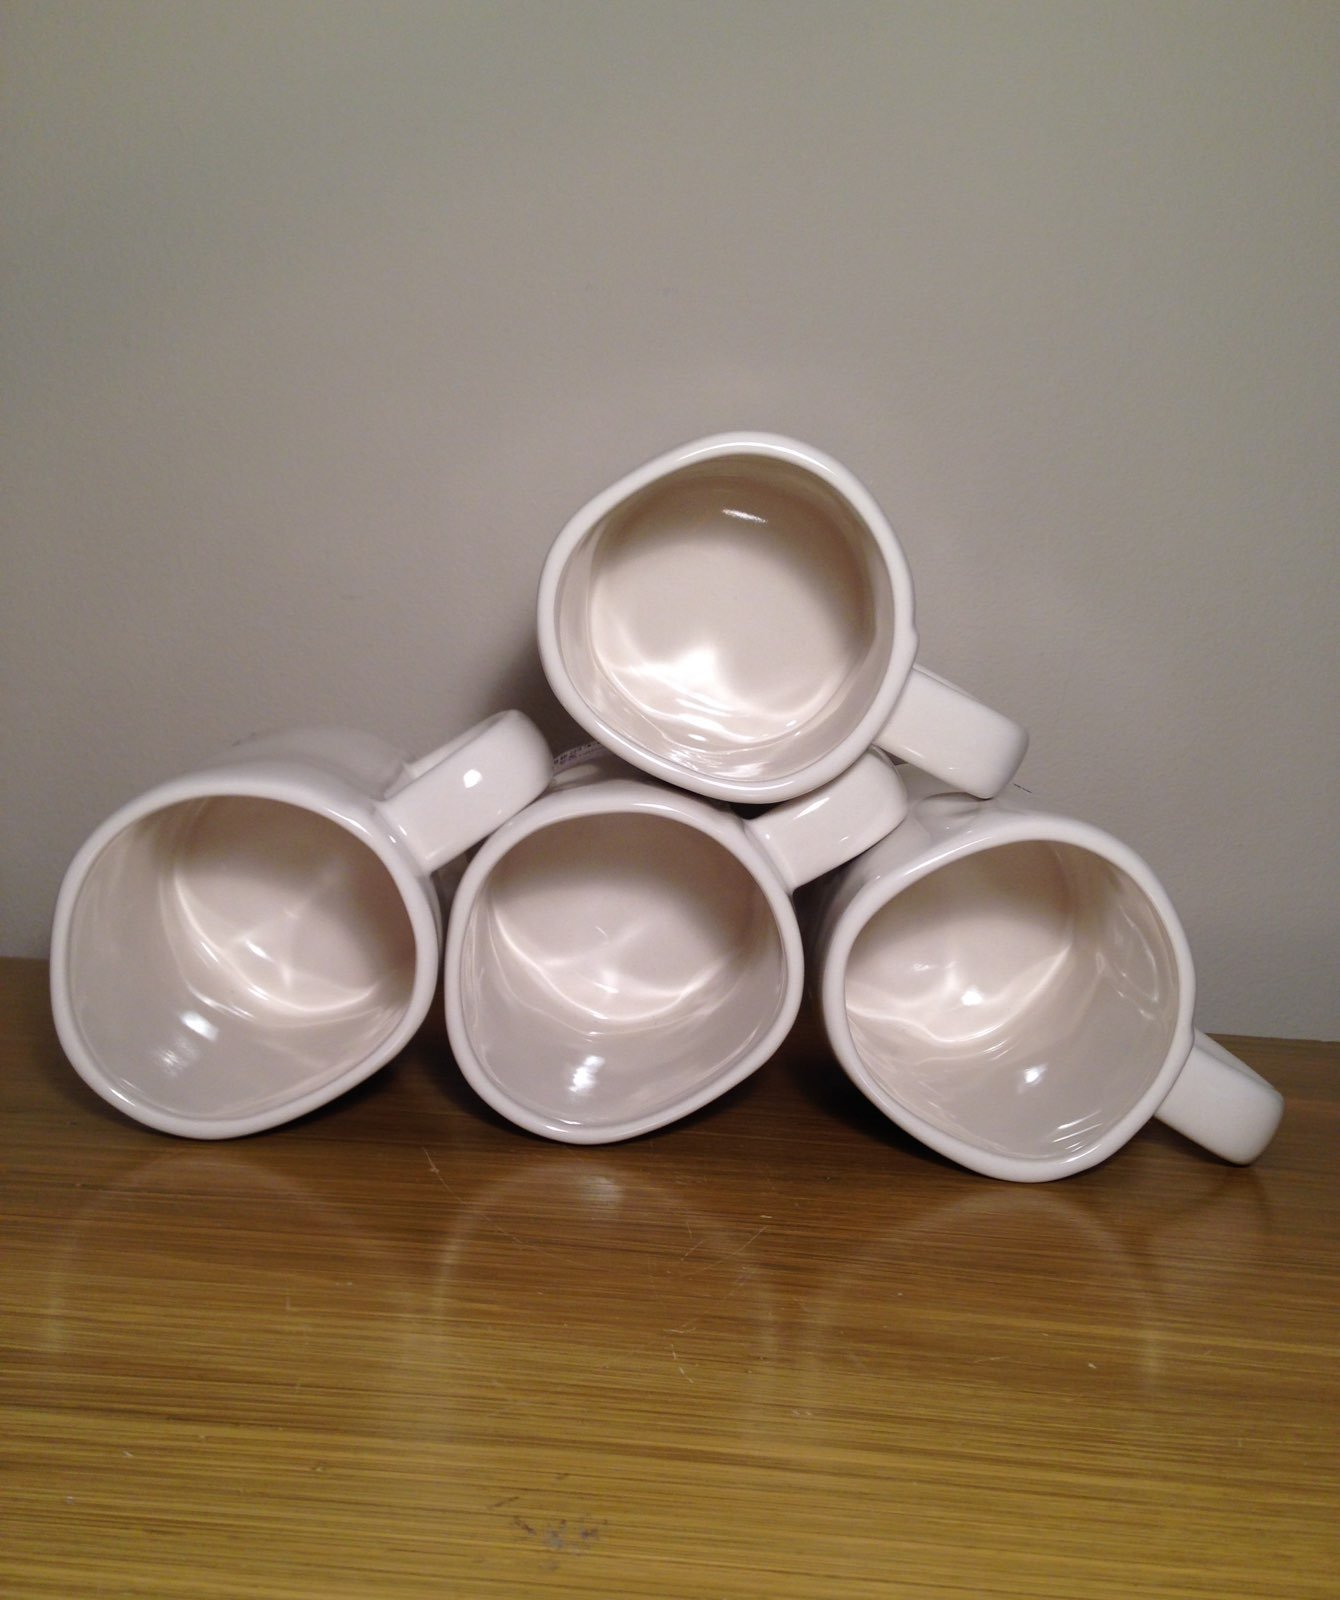 Rae Dunn Number Mugs 1. 2. 3. 4.